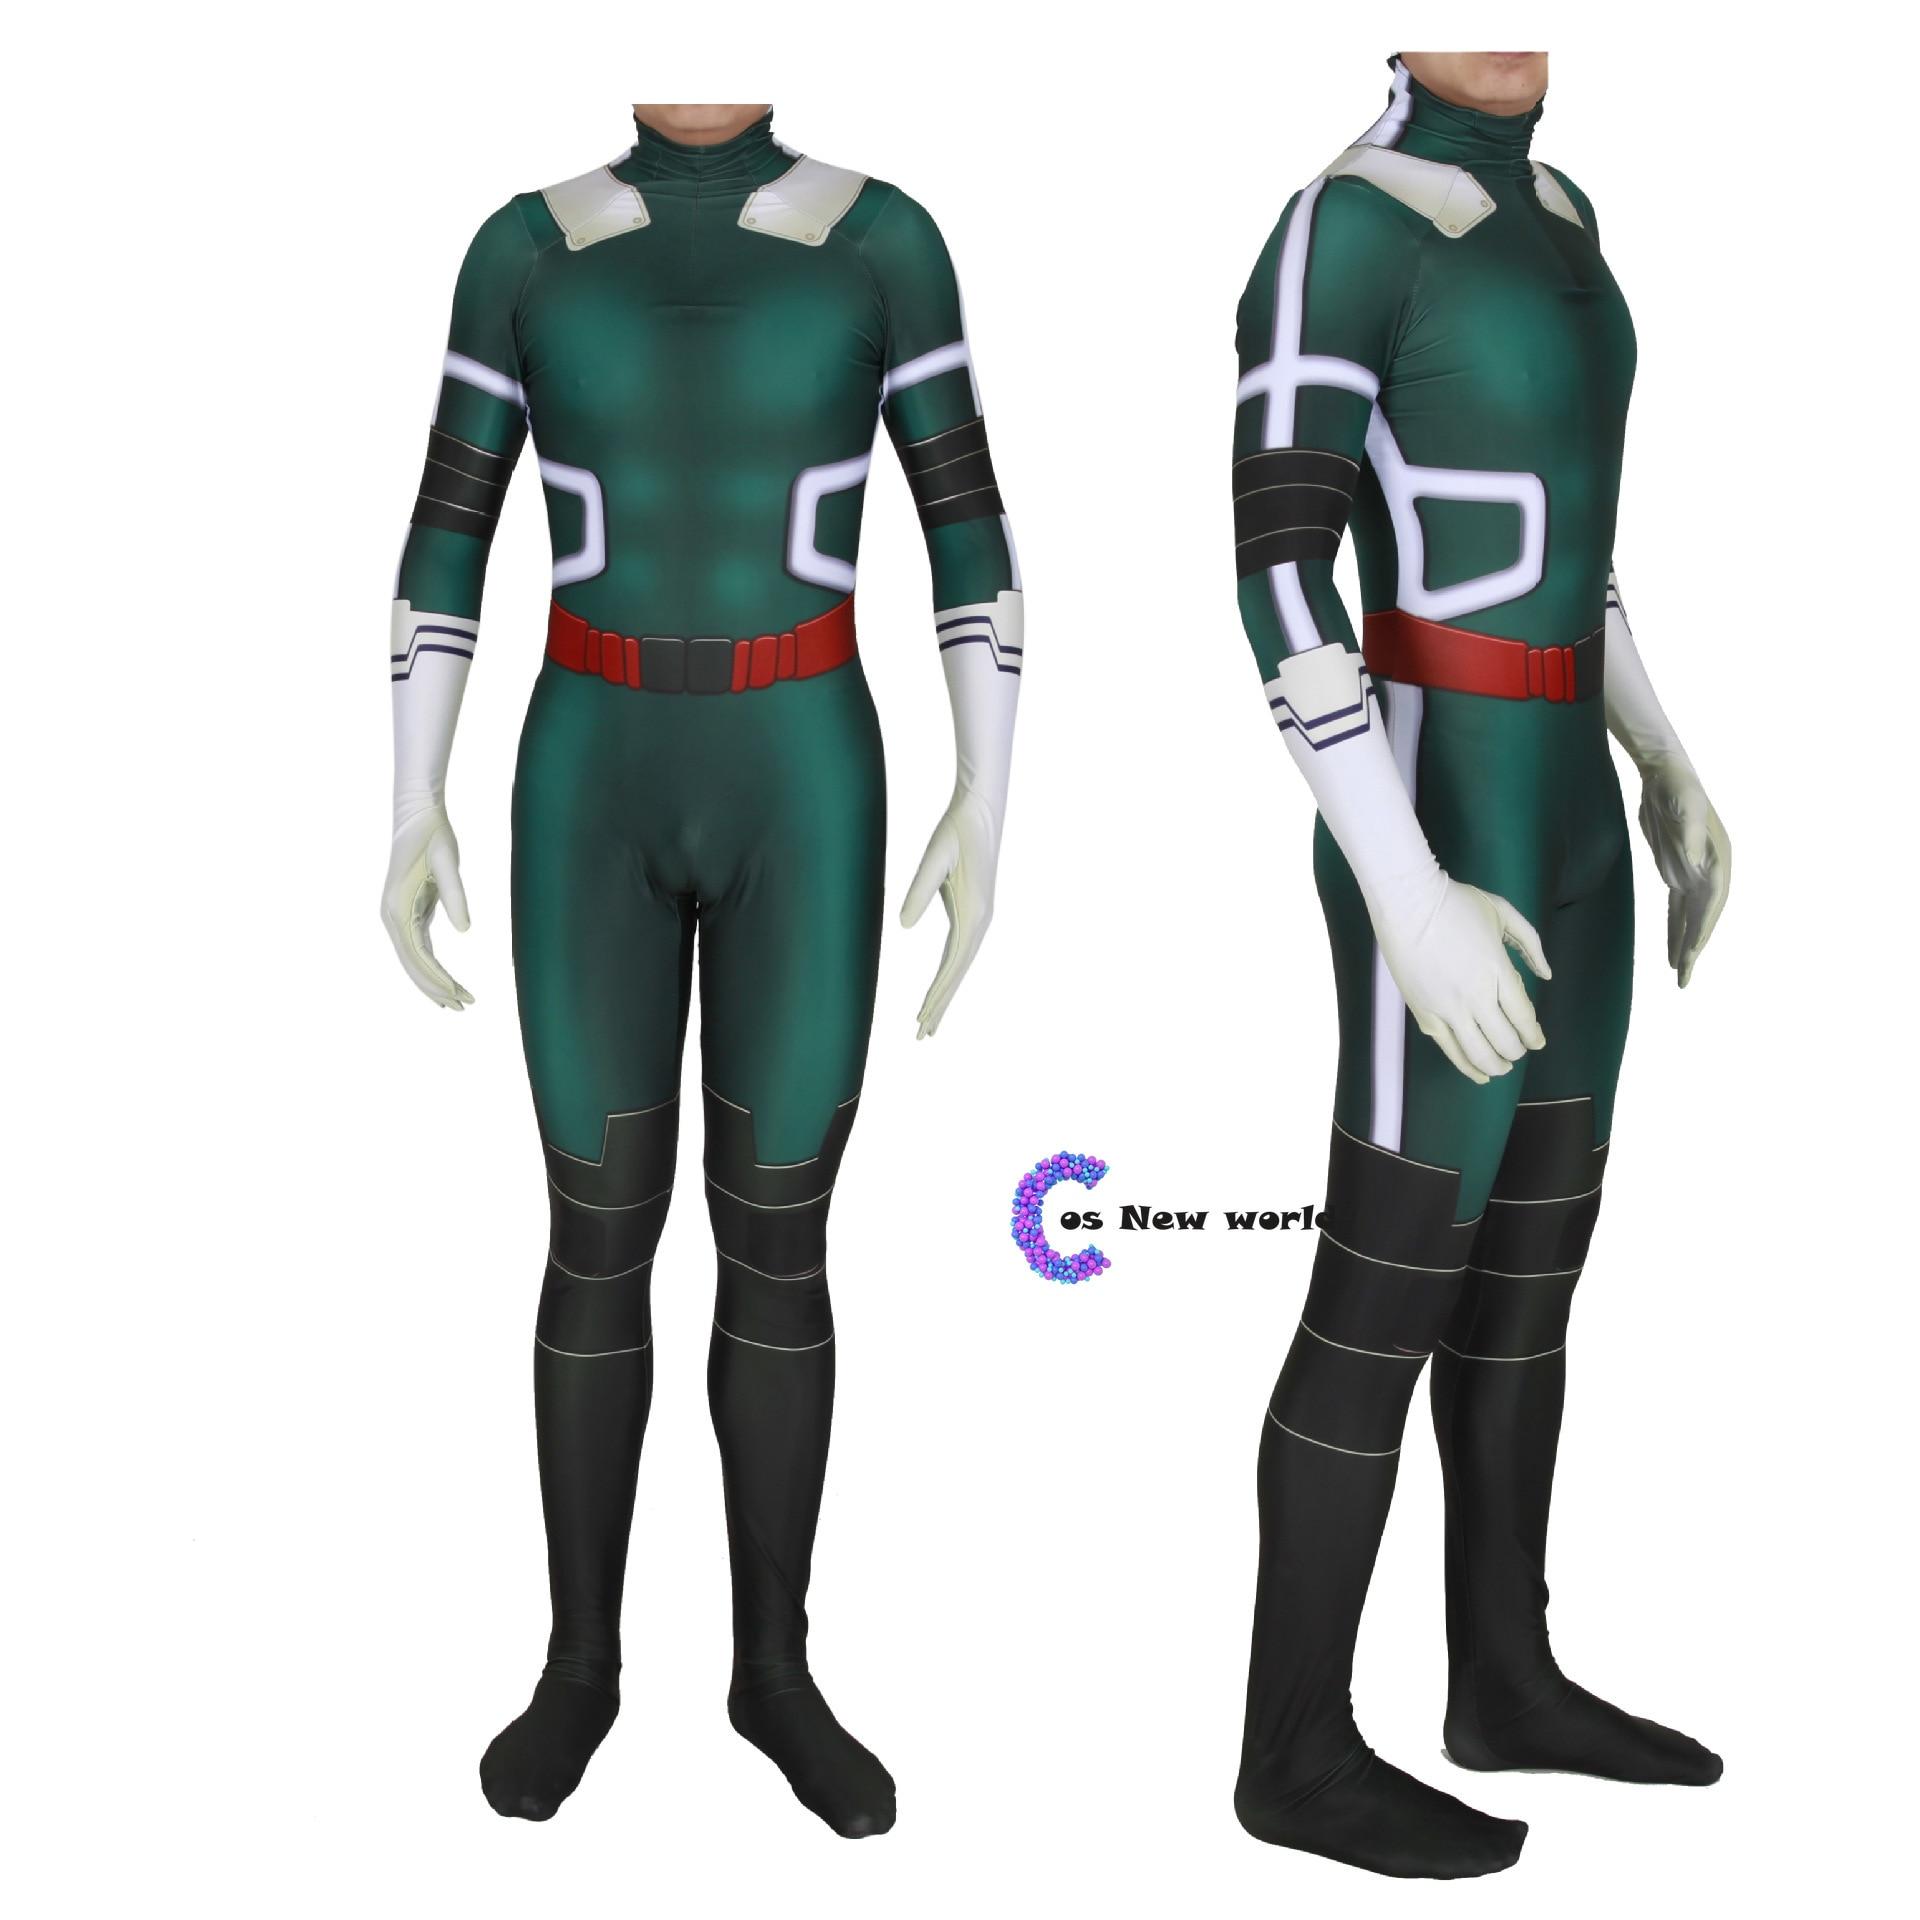 2020 New My Hero Academia Midoriya Izuko Deku Cosplay Costumes Men Women Girls Zentai Suit Halloween Bodysuit for Kids Adult